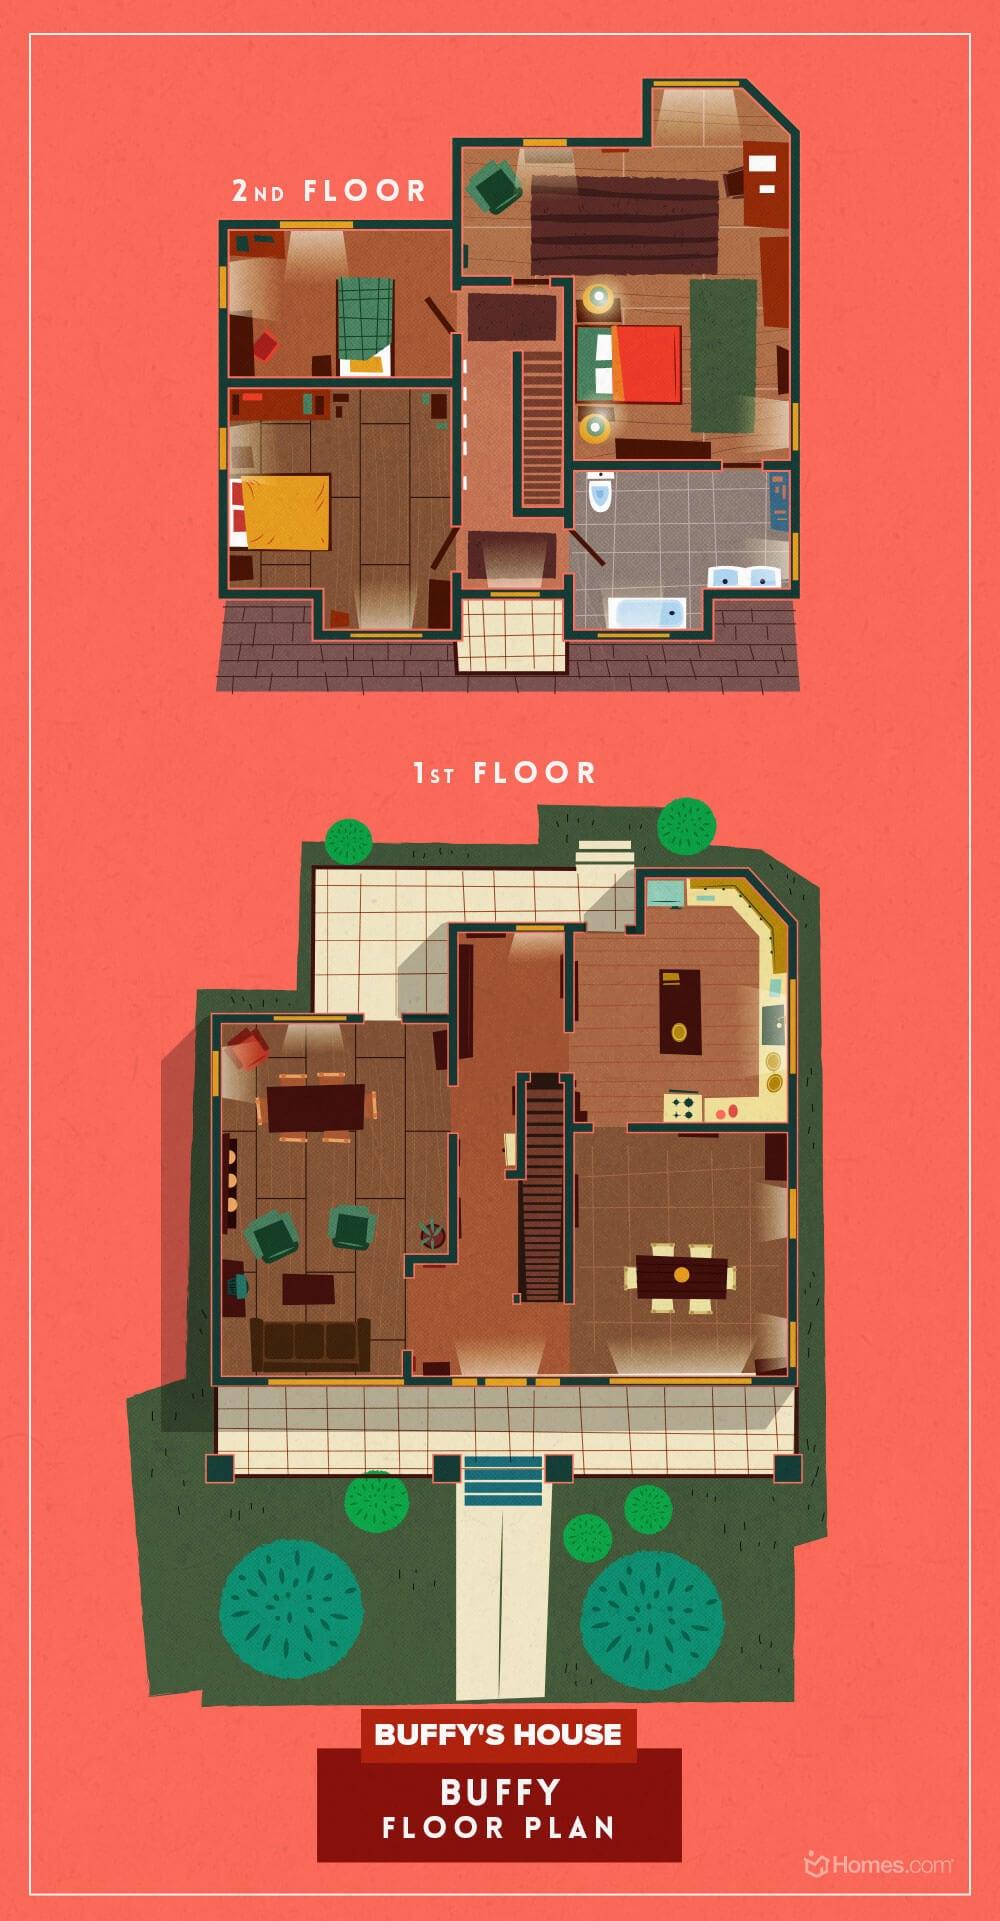 home-floor-plans-illustrations-2